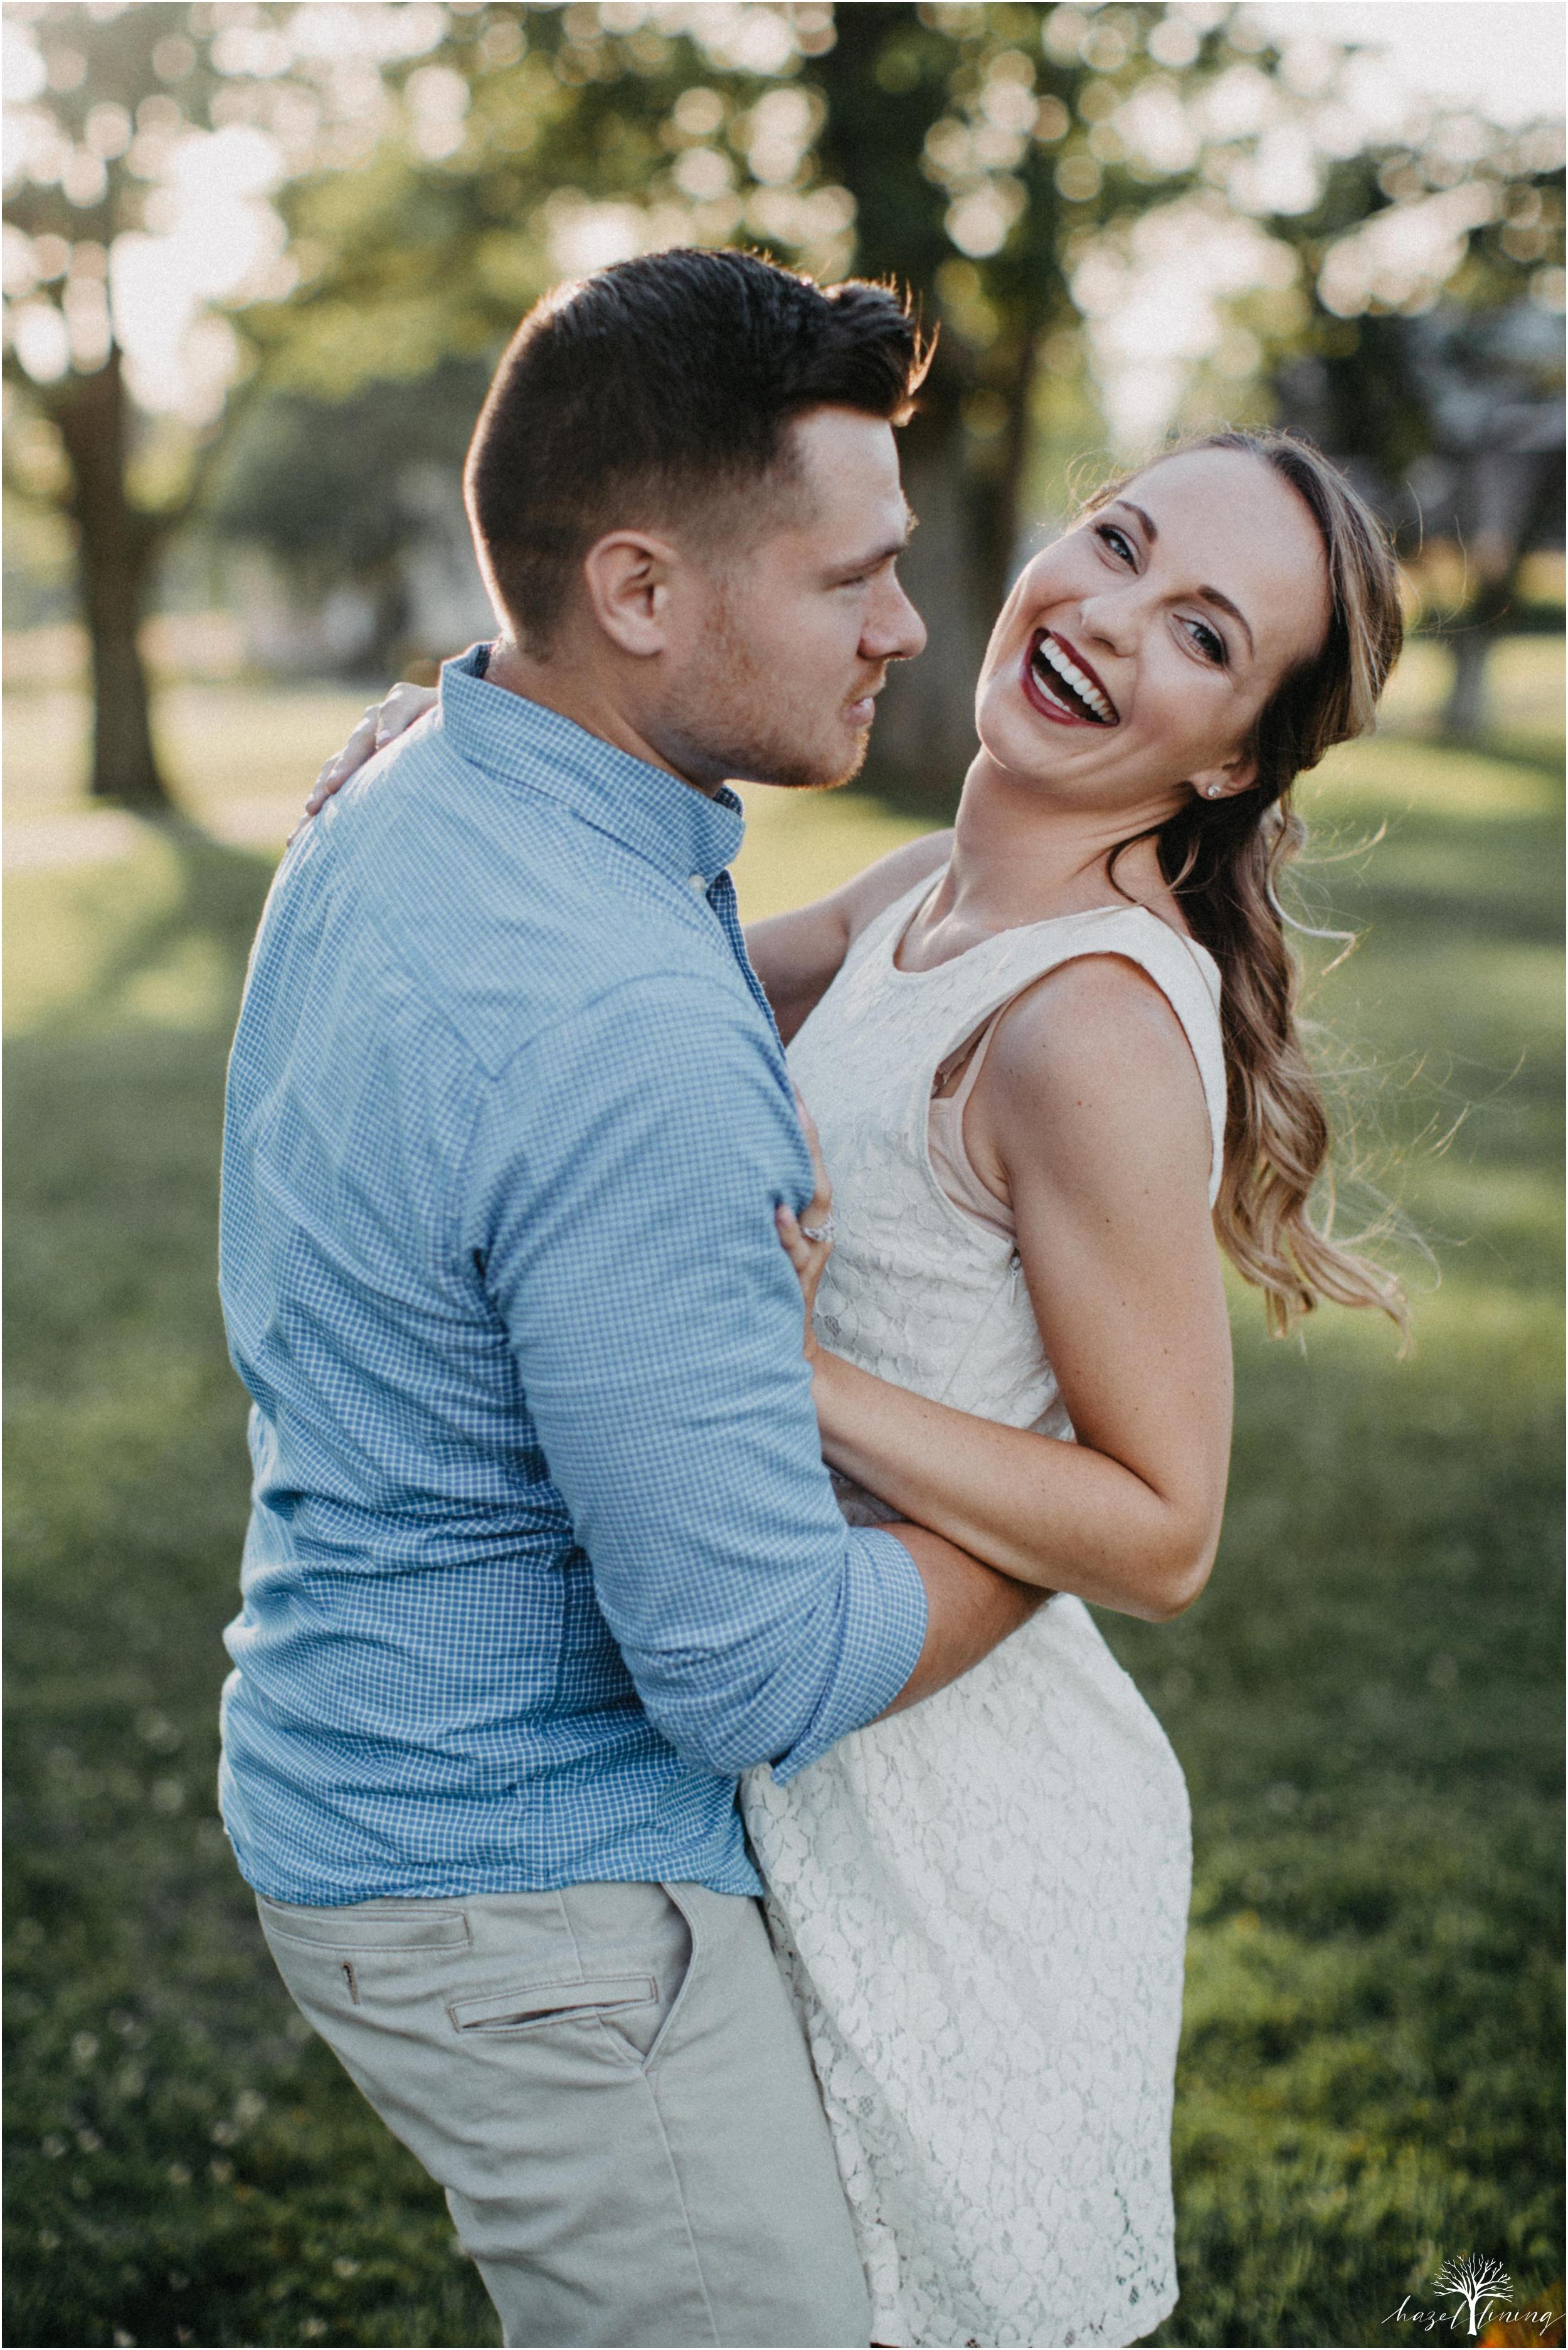 rachel-warner-chris-niedrist-the-farm-bakery-and-events-quakertown-pa-summer-engagement-hazel-lining-photography-destination-elopement-wedding-engagement-photography_0012.jpg